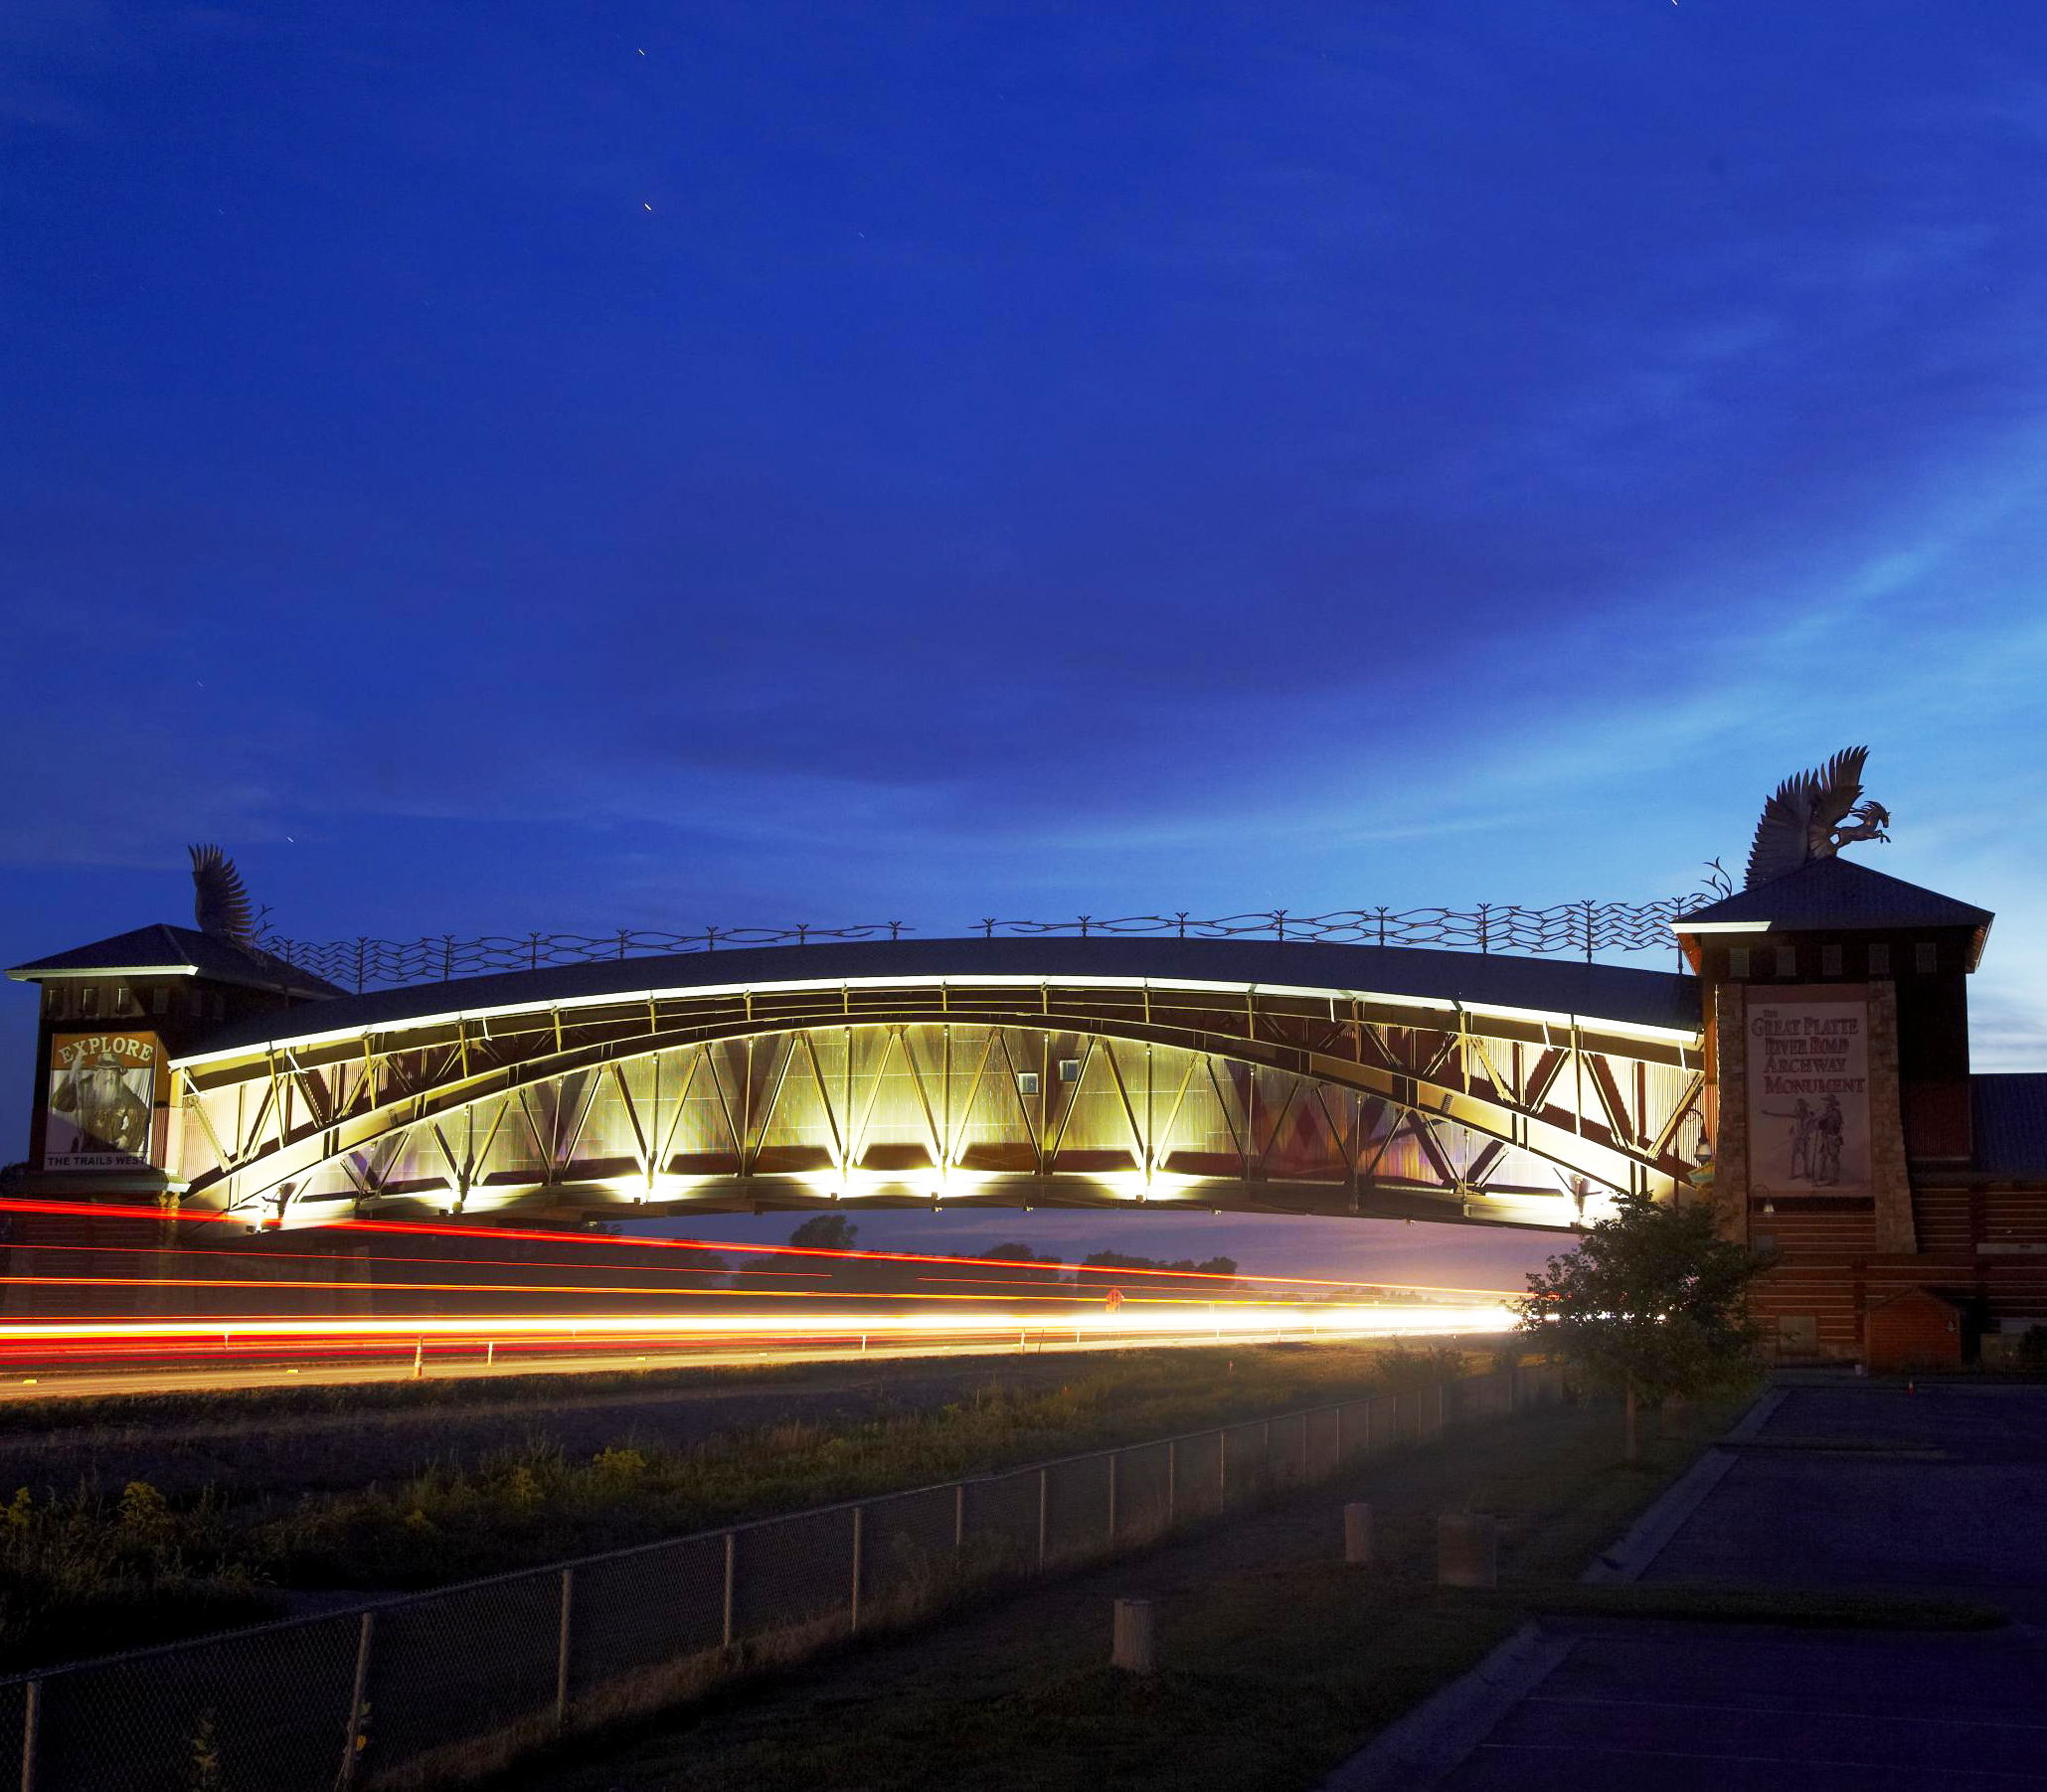 Kearney, Nebraska: The Archway